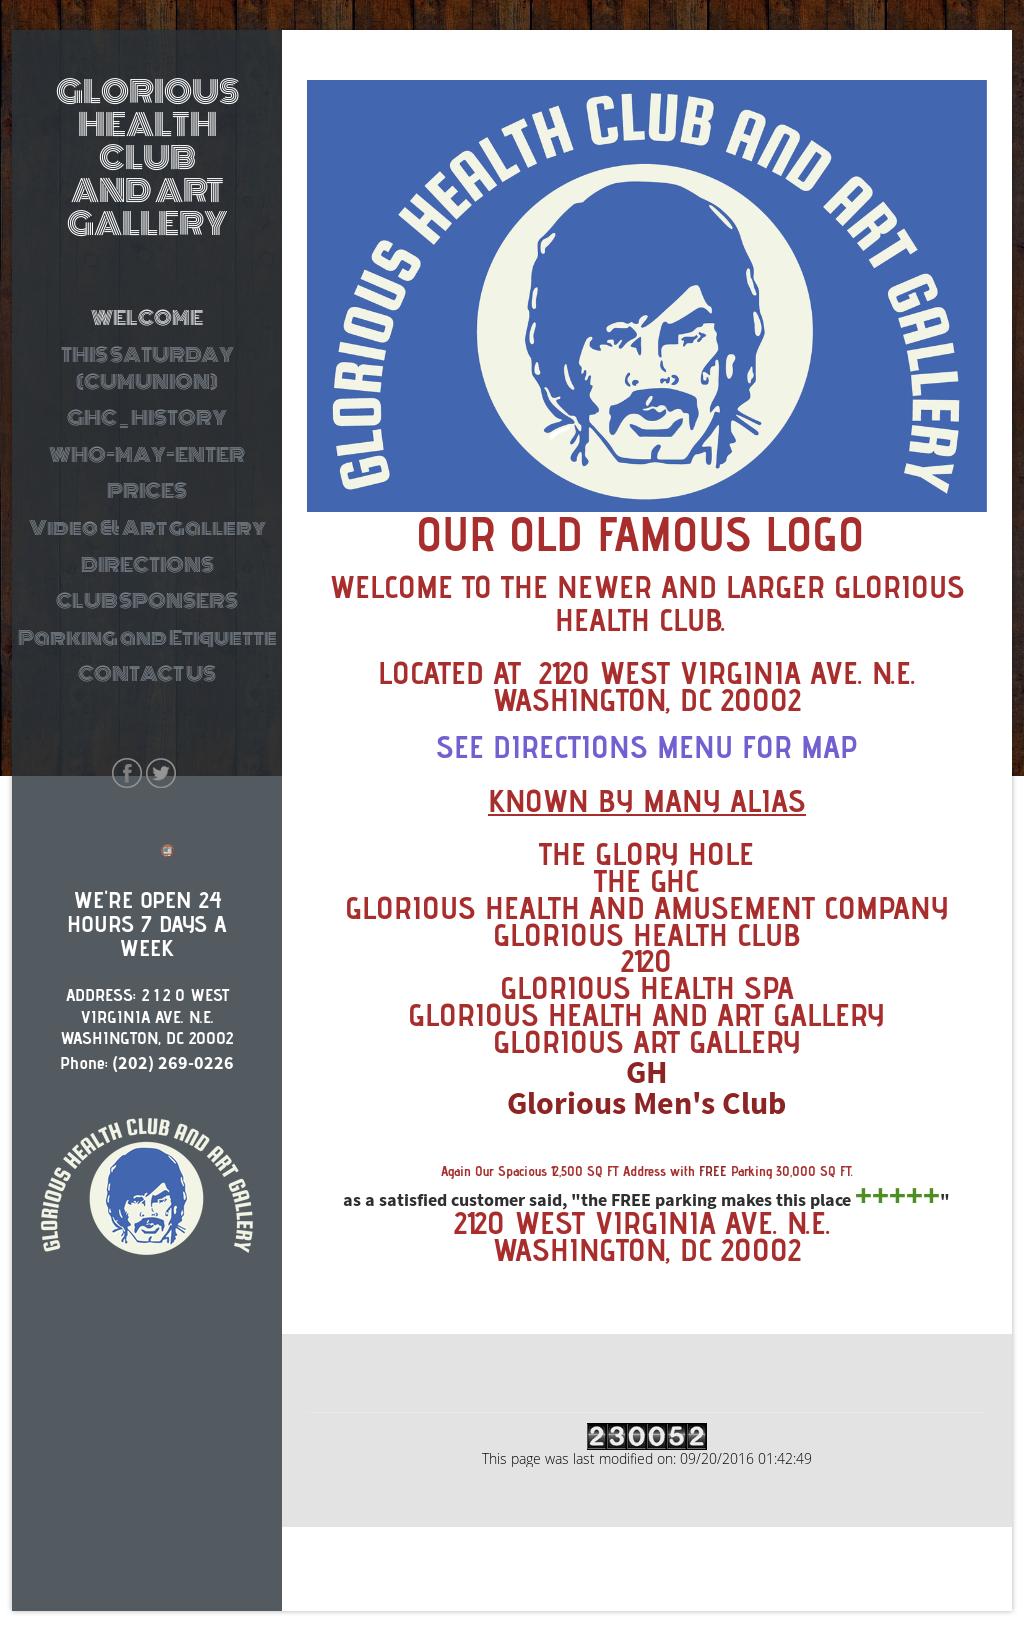 Glorious health club washington dc